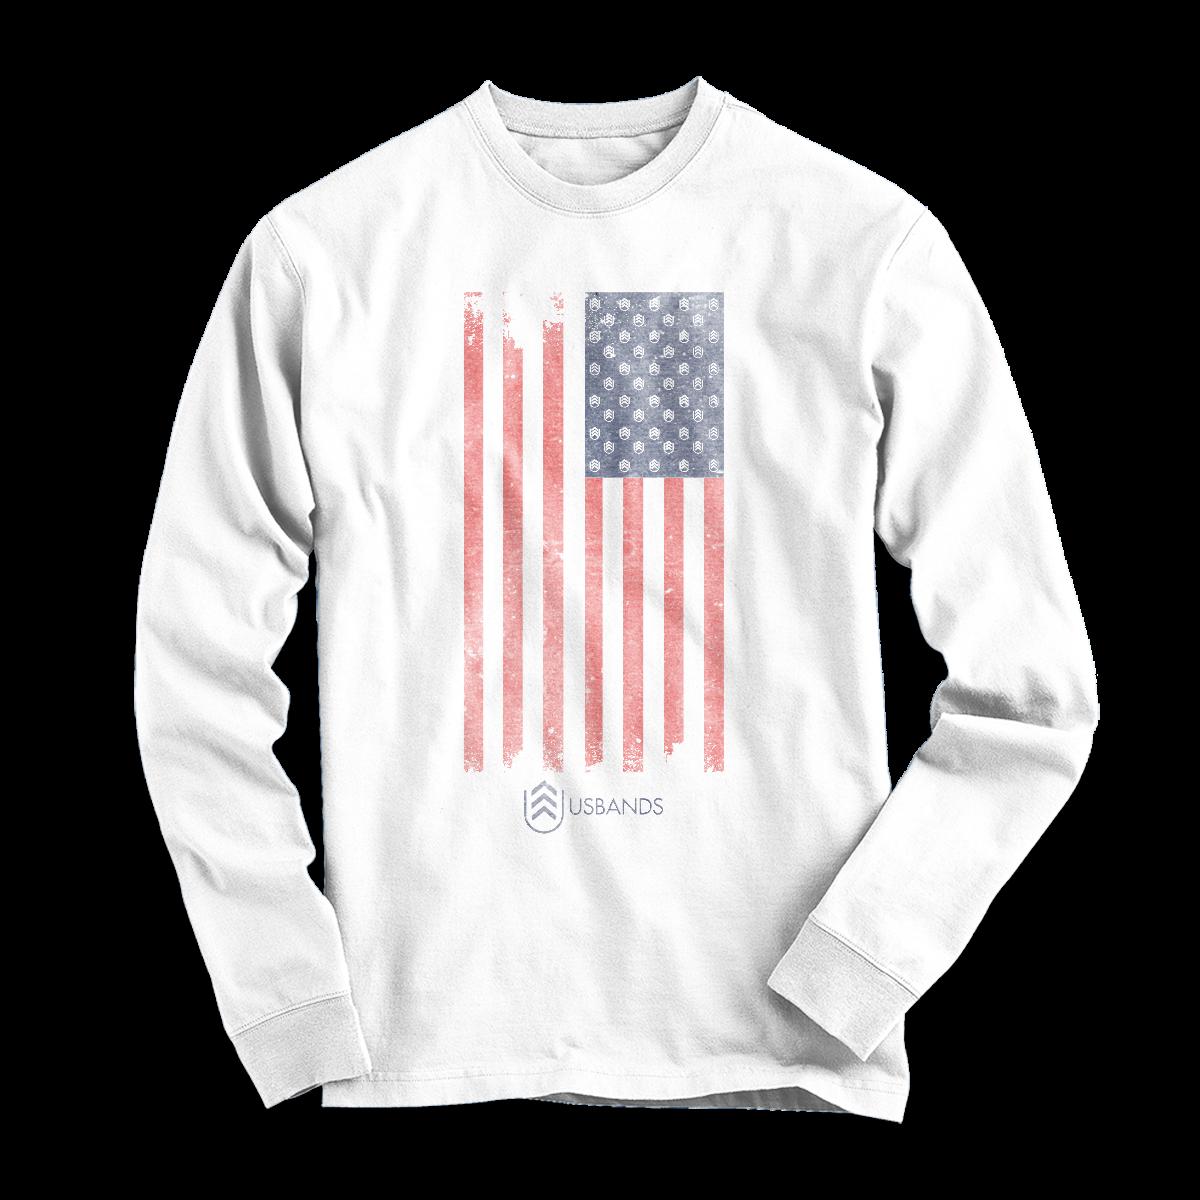 USBands Long Sleeve Flag Shirt